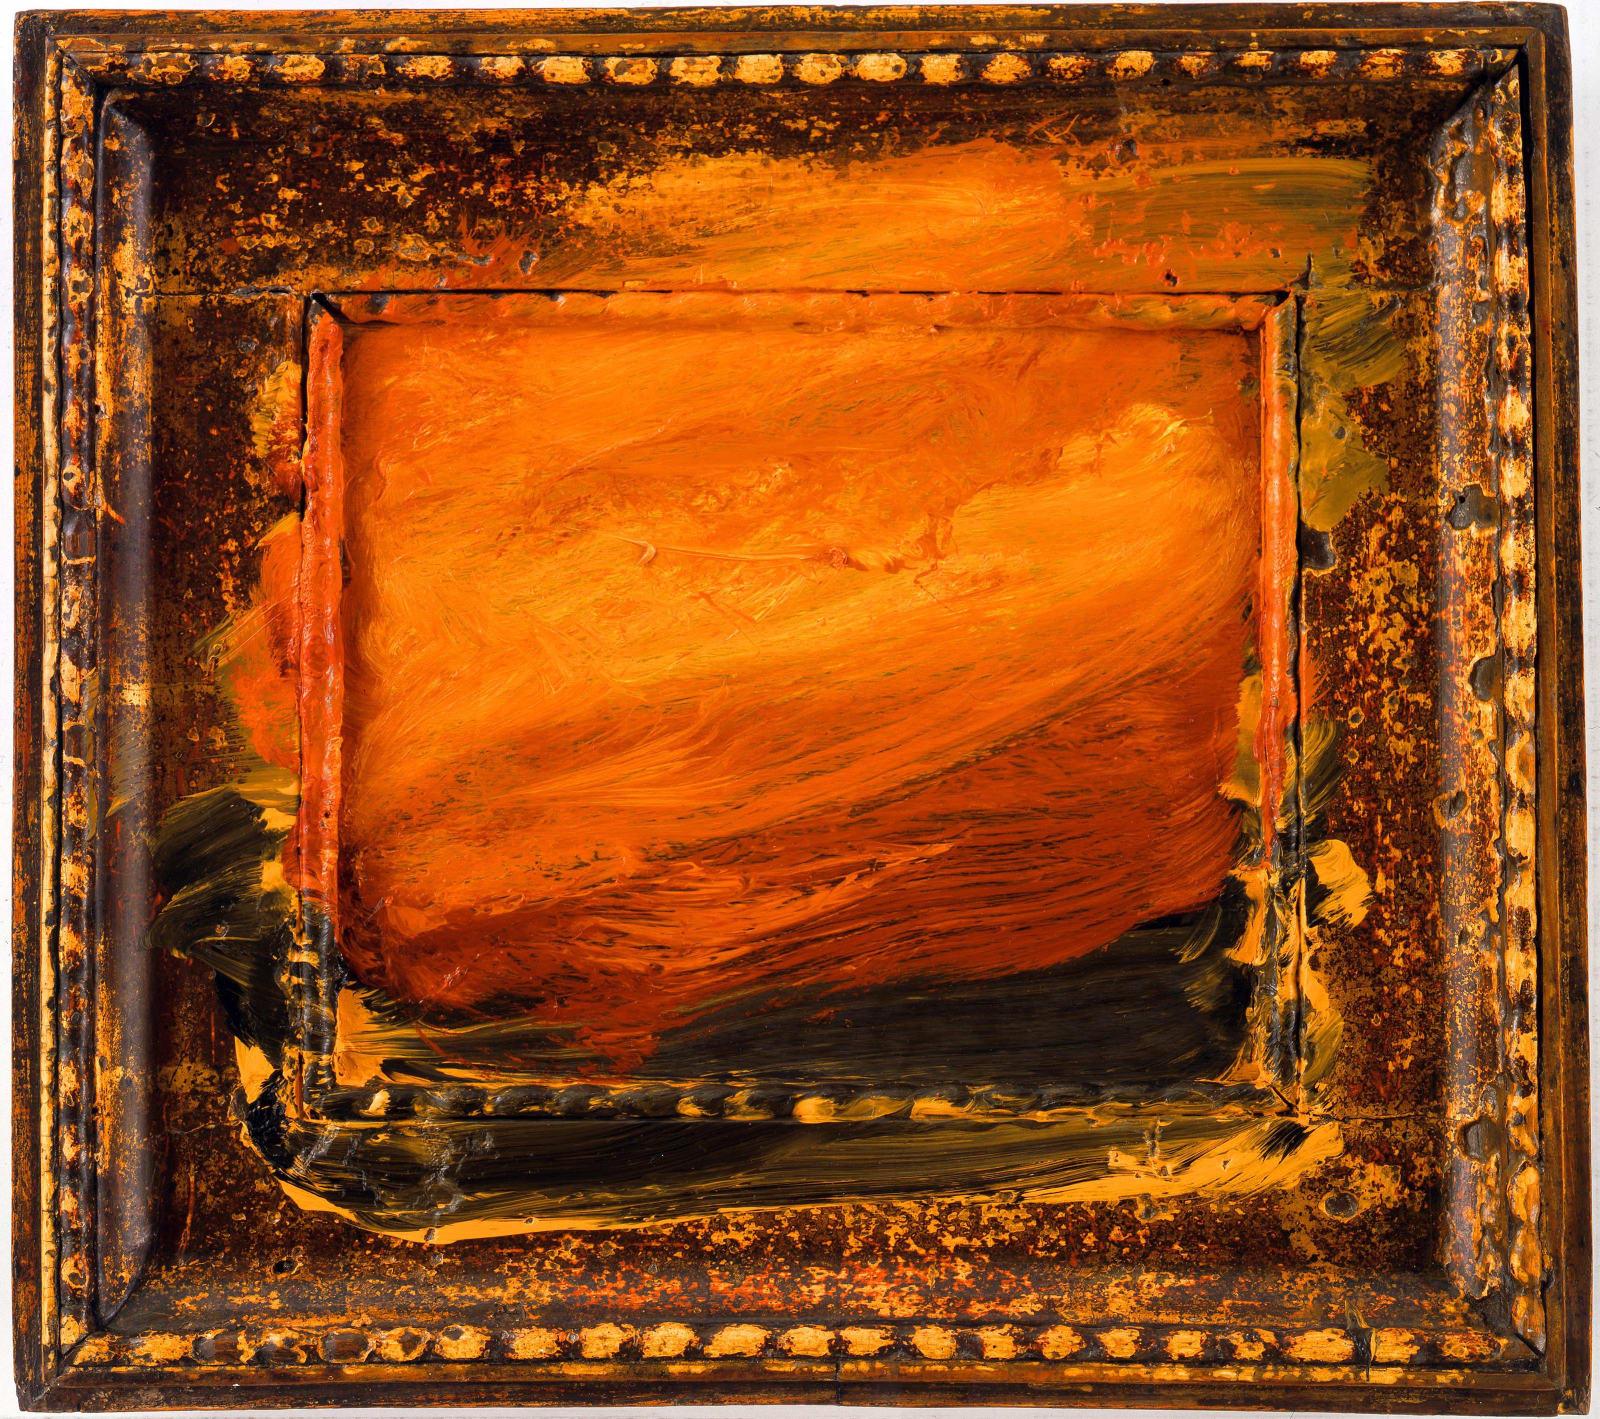 Old Sky, 1996-97